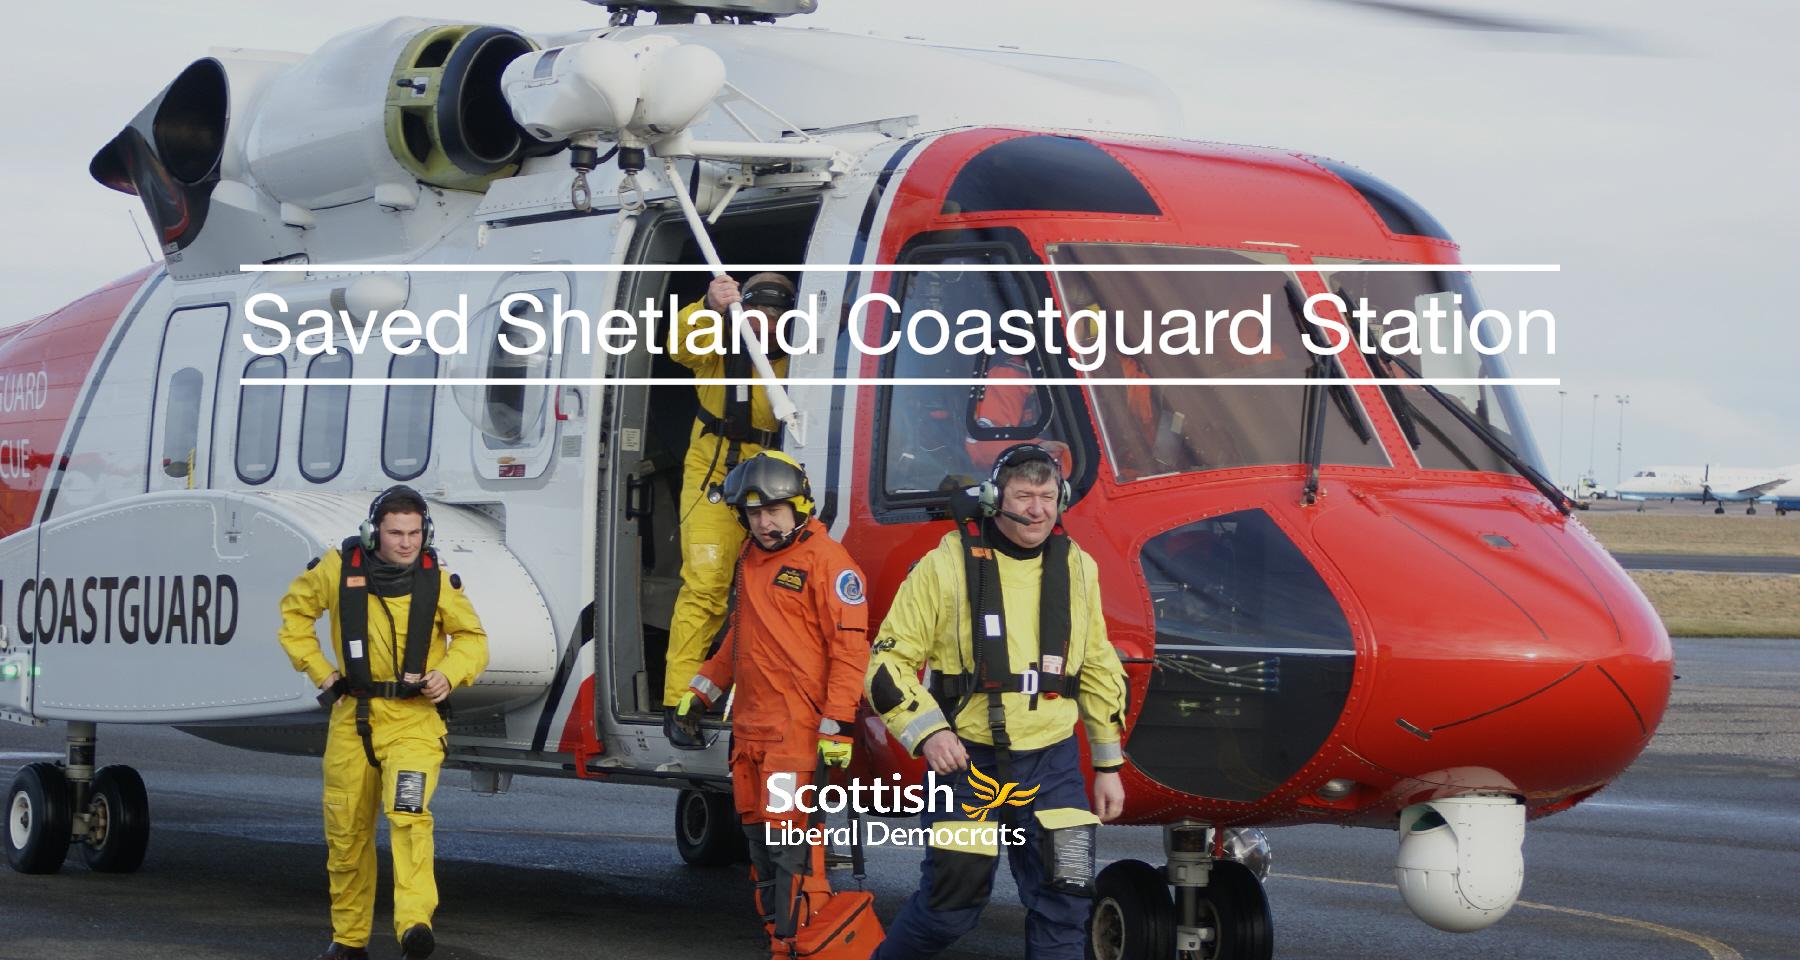 Saved Shetland Coastguard Station